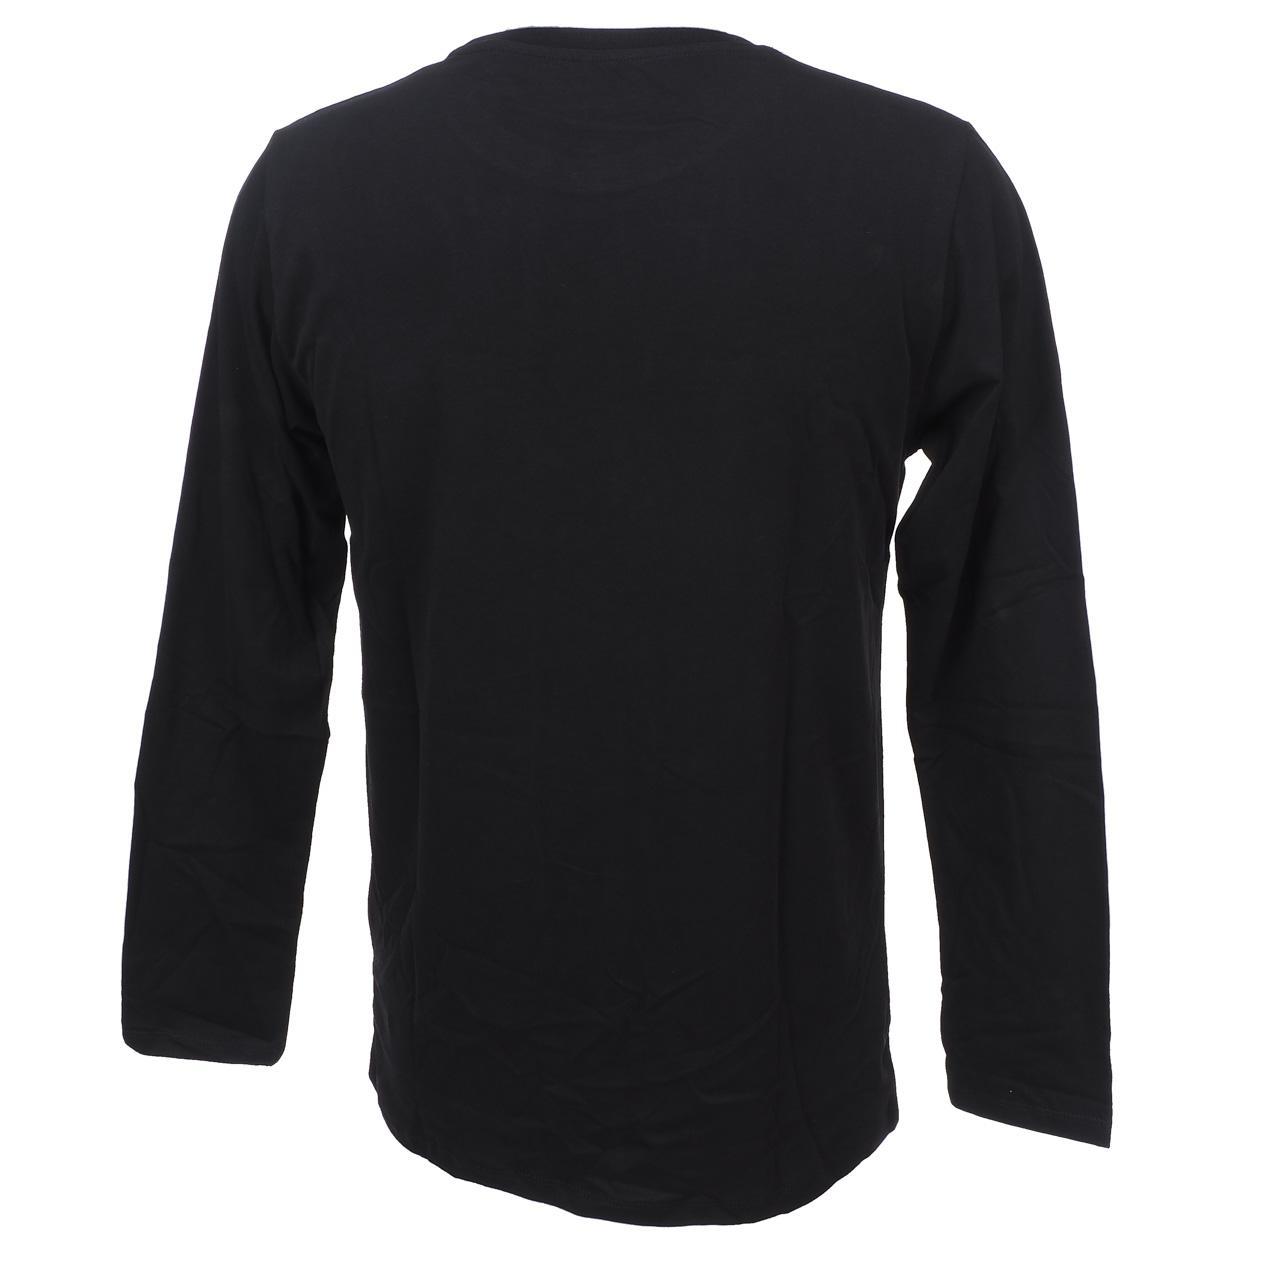 Tee-shirt-manches-longues-Pepe-jeans-Blake-black-ml-tee-jr-Noir-14082-Neuf miniature 4